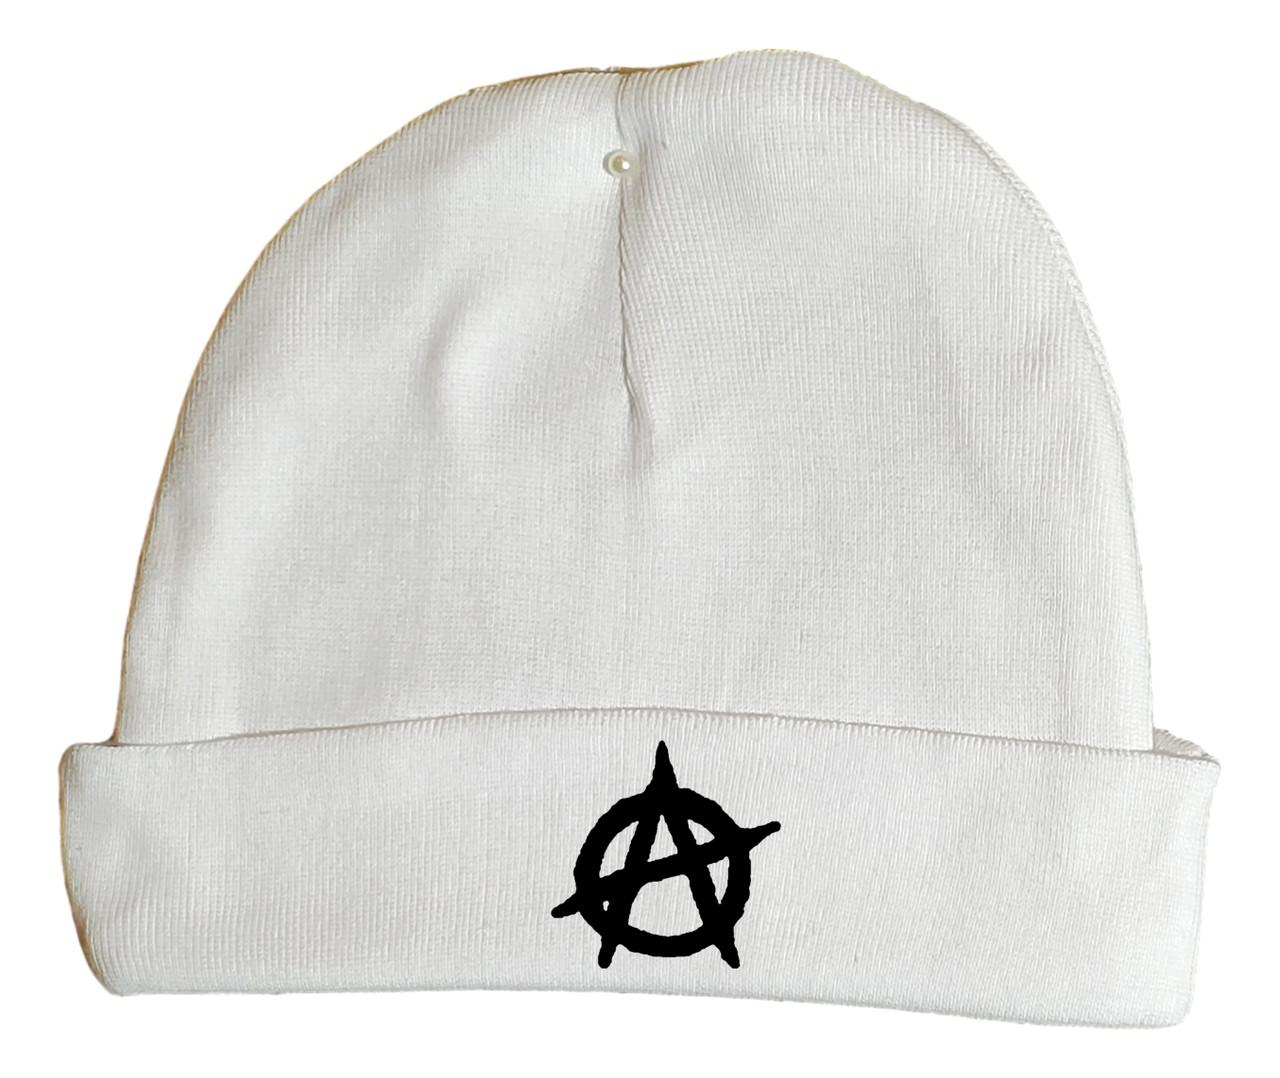 Anarchy Symbol Punk White Hat Infant Baby Beanie Cap